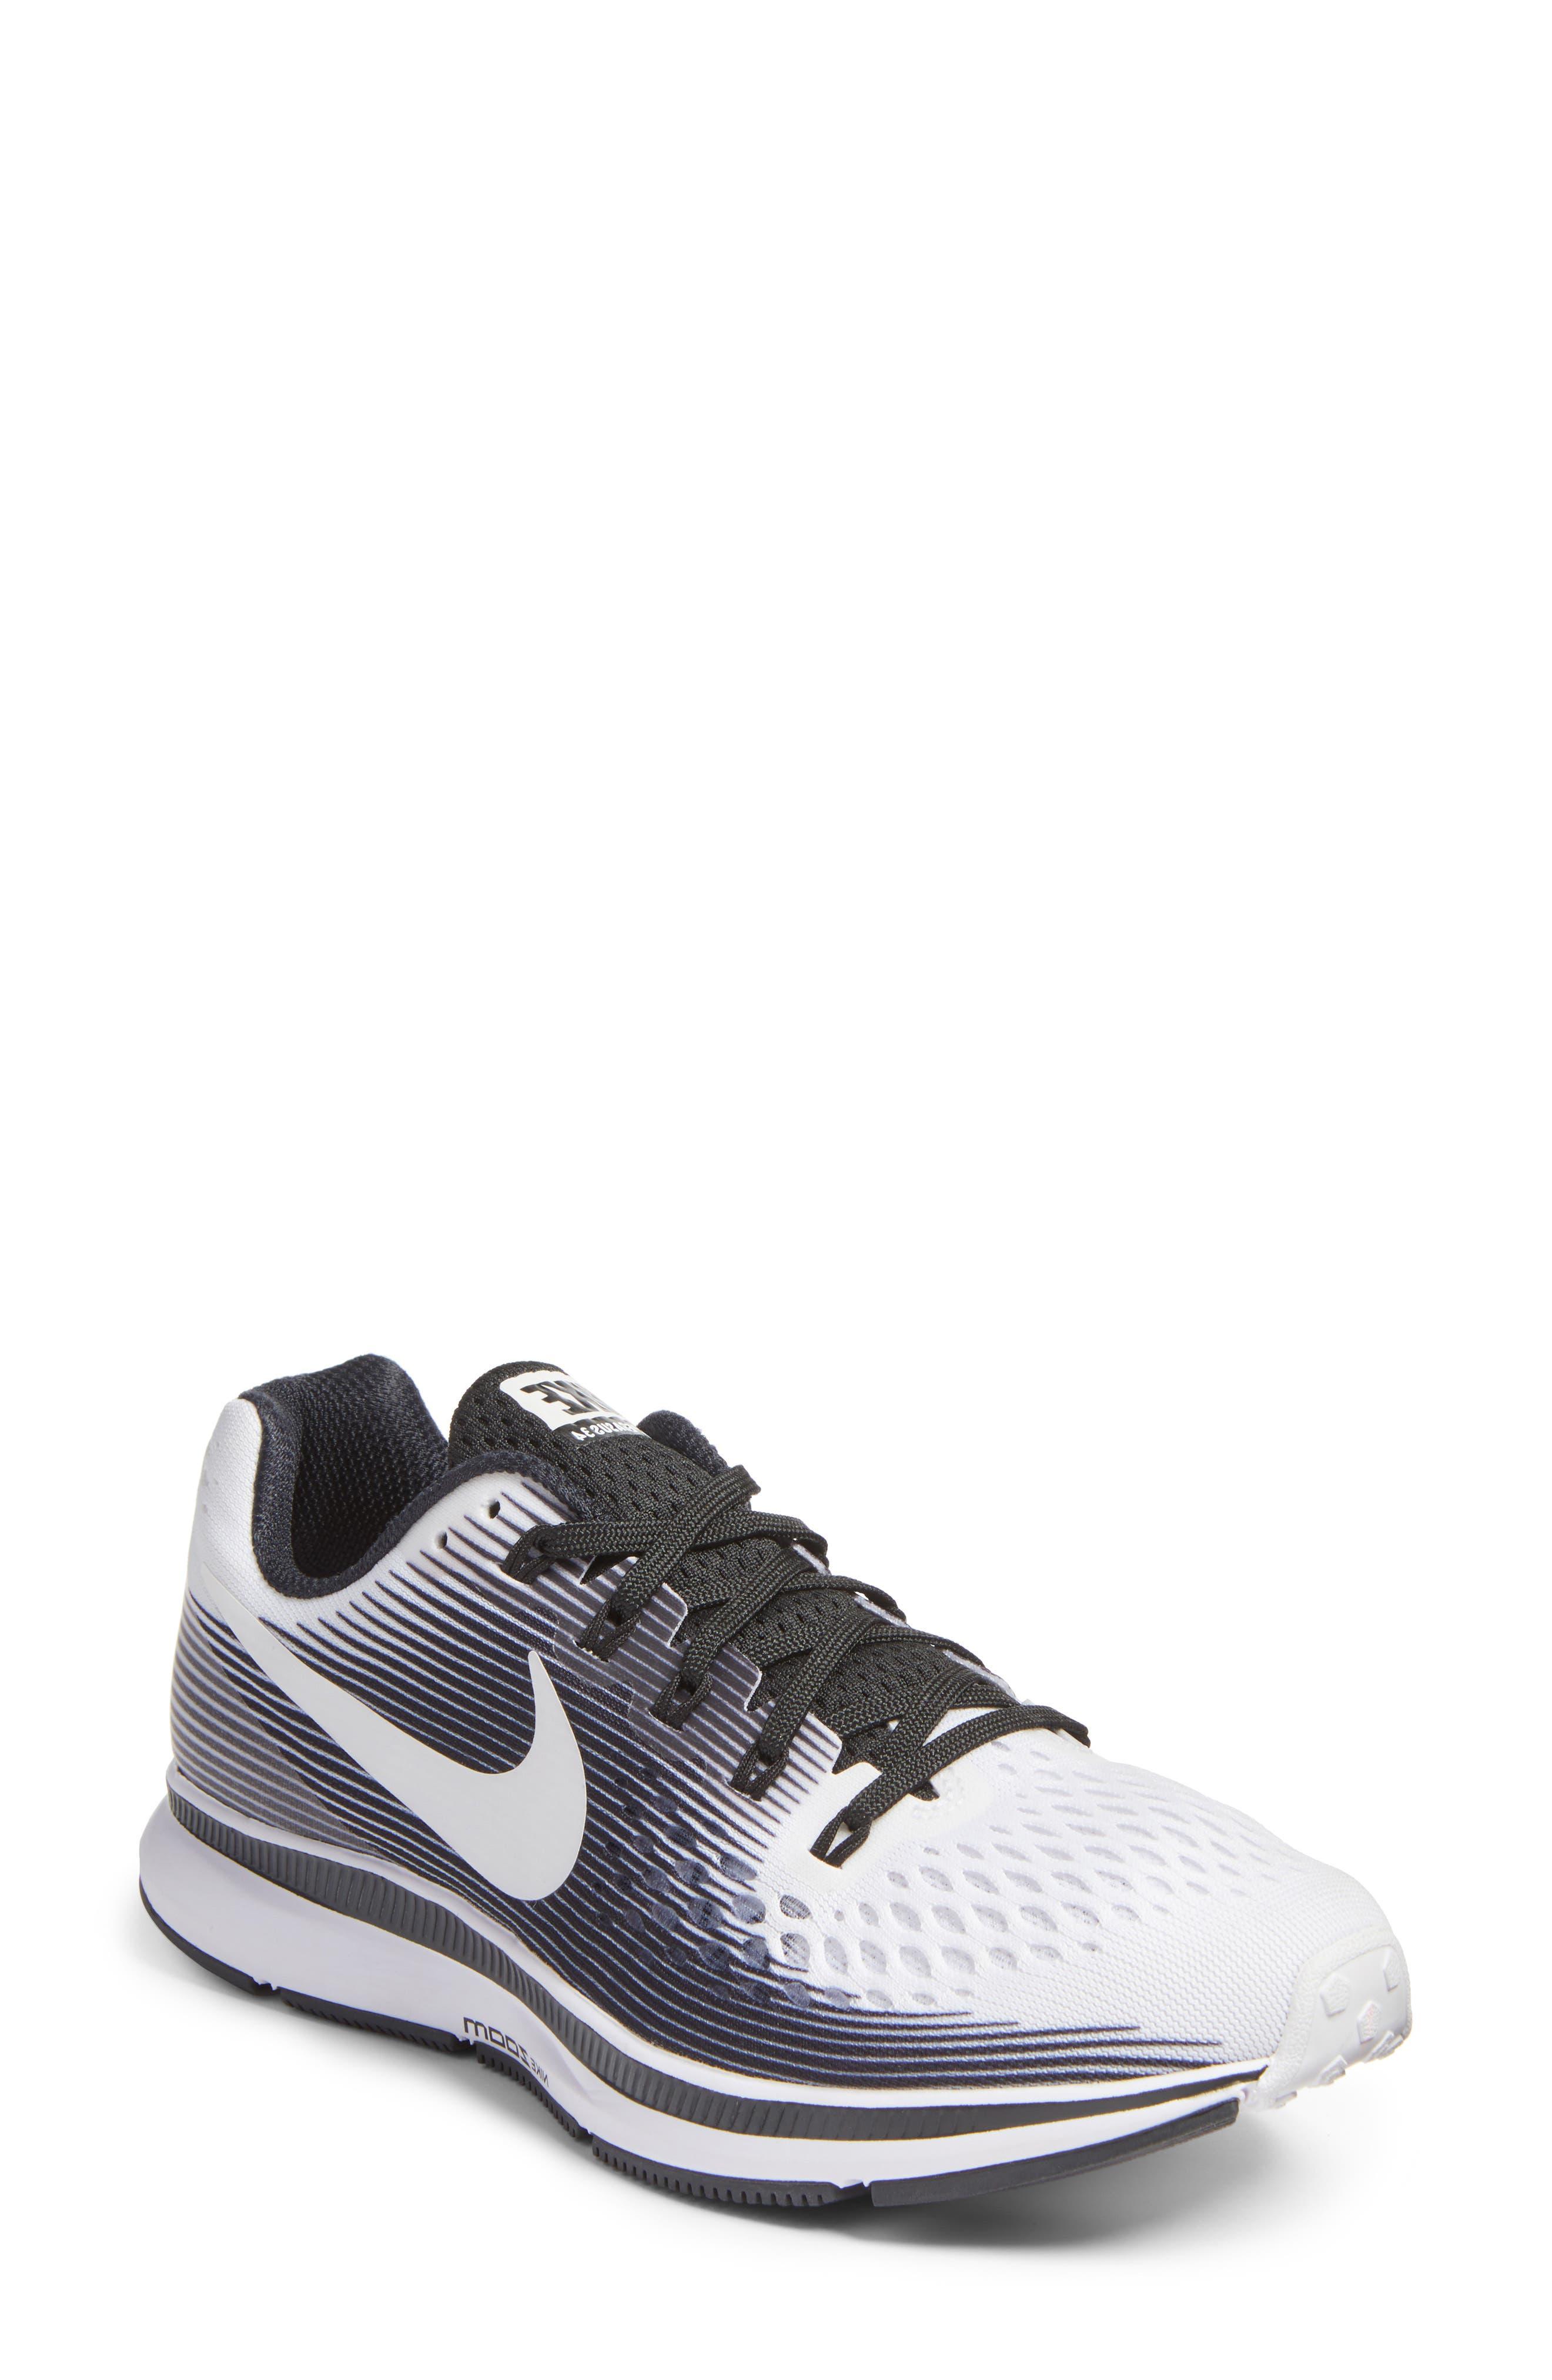 Air Zoom Pegasus 34 LE Running Shoe,                         Main,                         color, White/ White/ Black